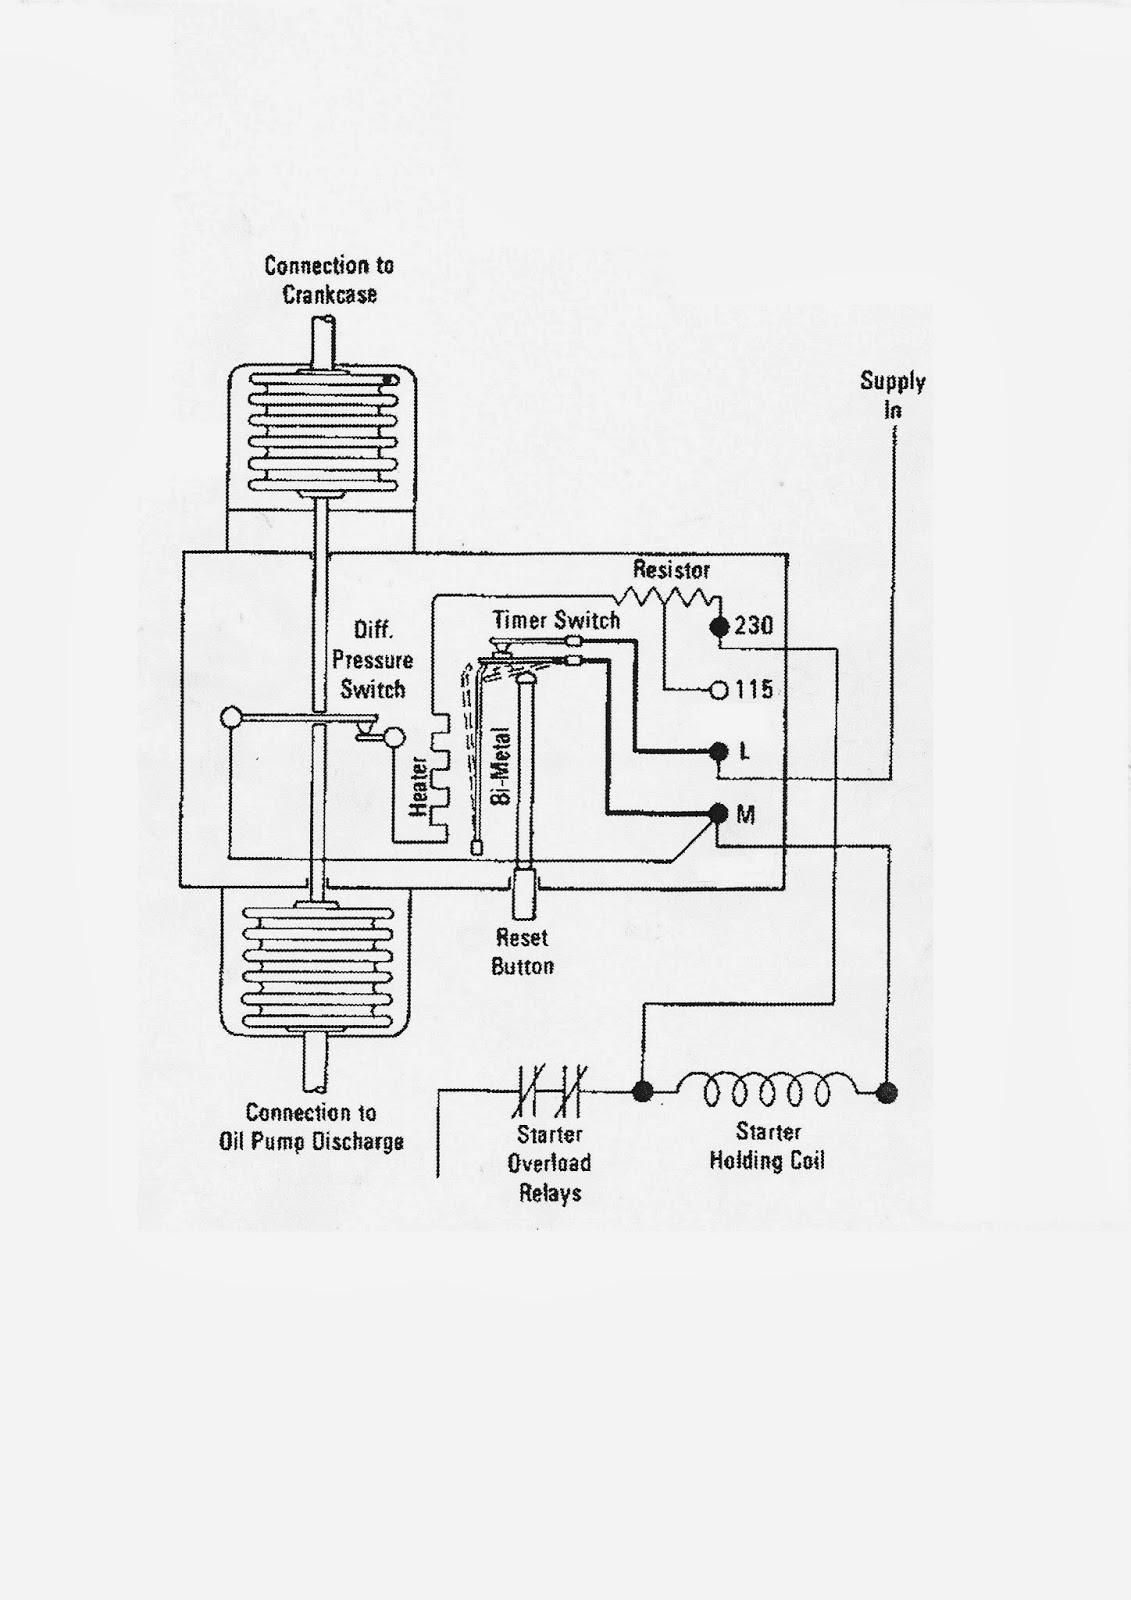 Refrigeration Control Wiring Diagram